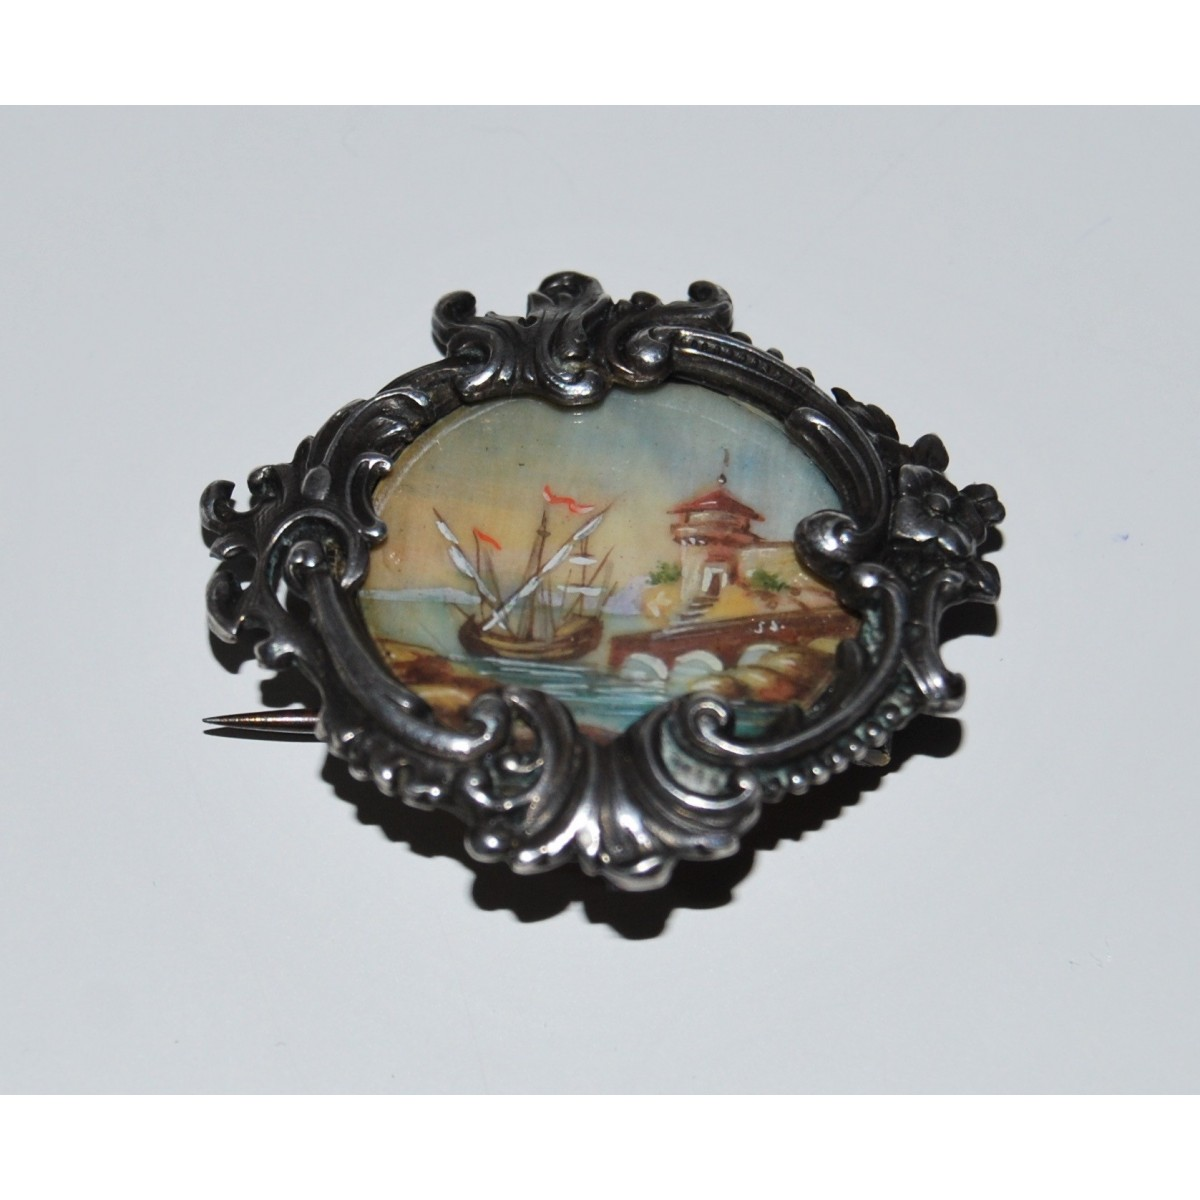 Spilla d'argento, fine 800, miniatura dipinta